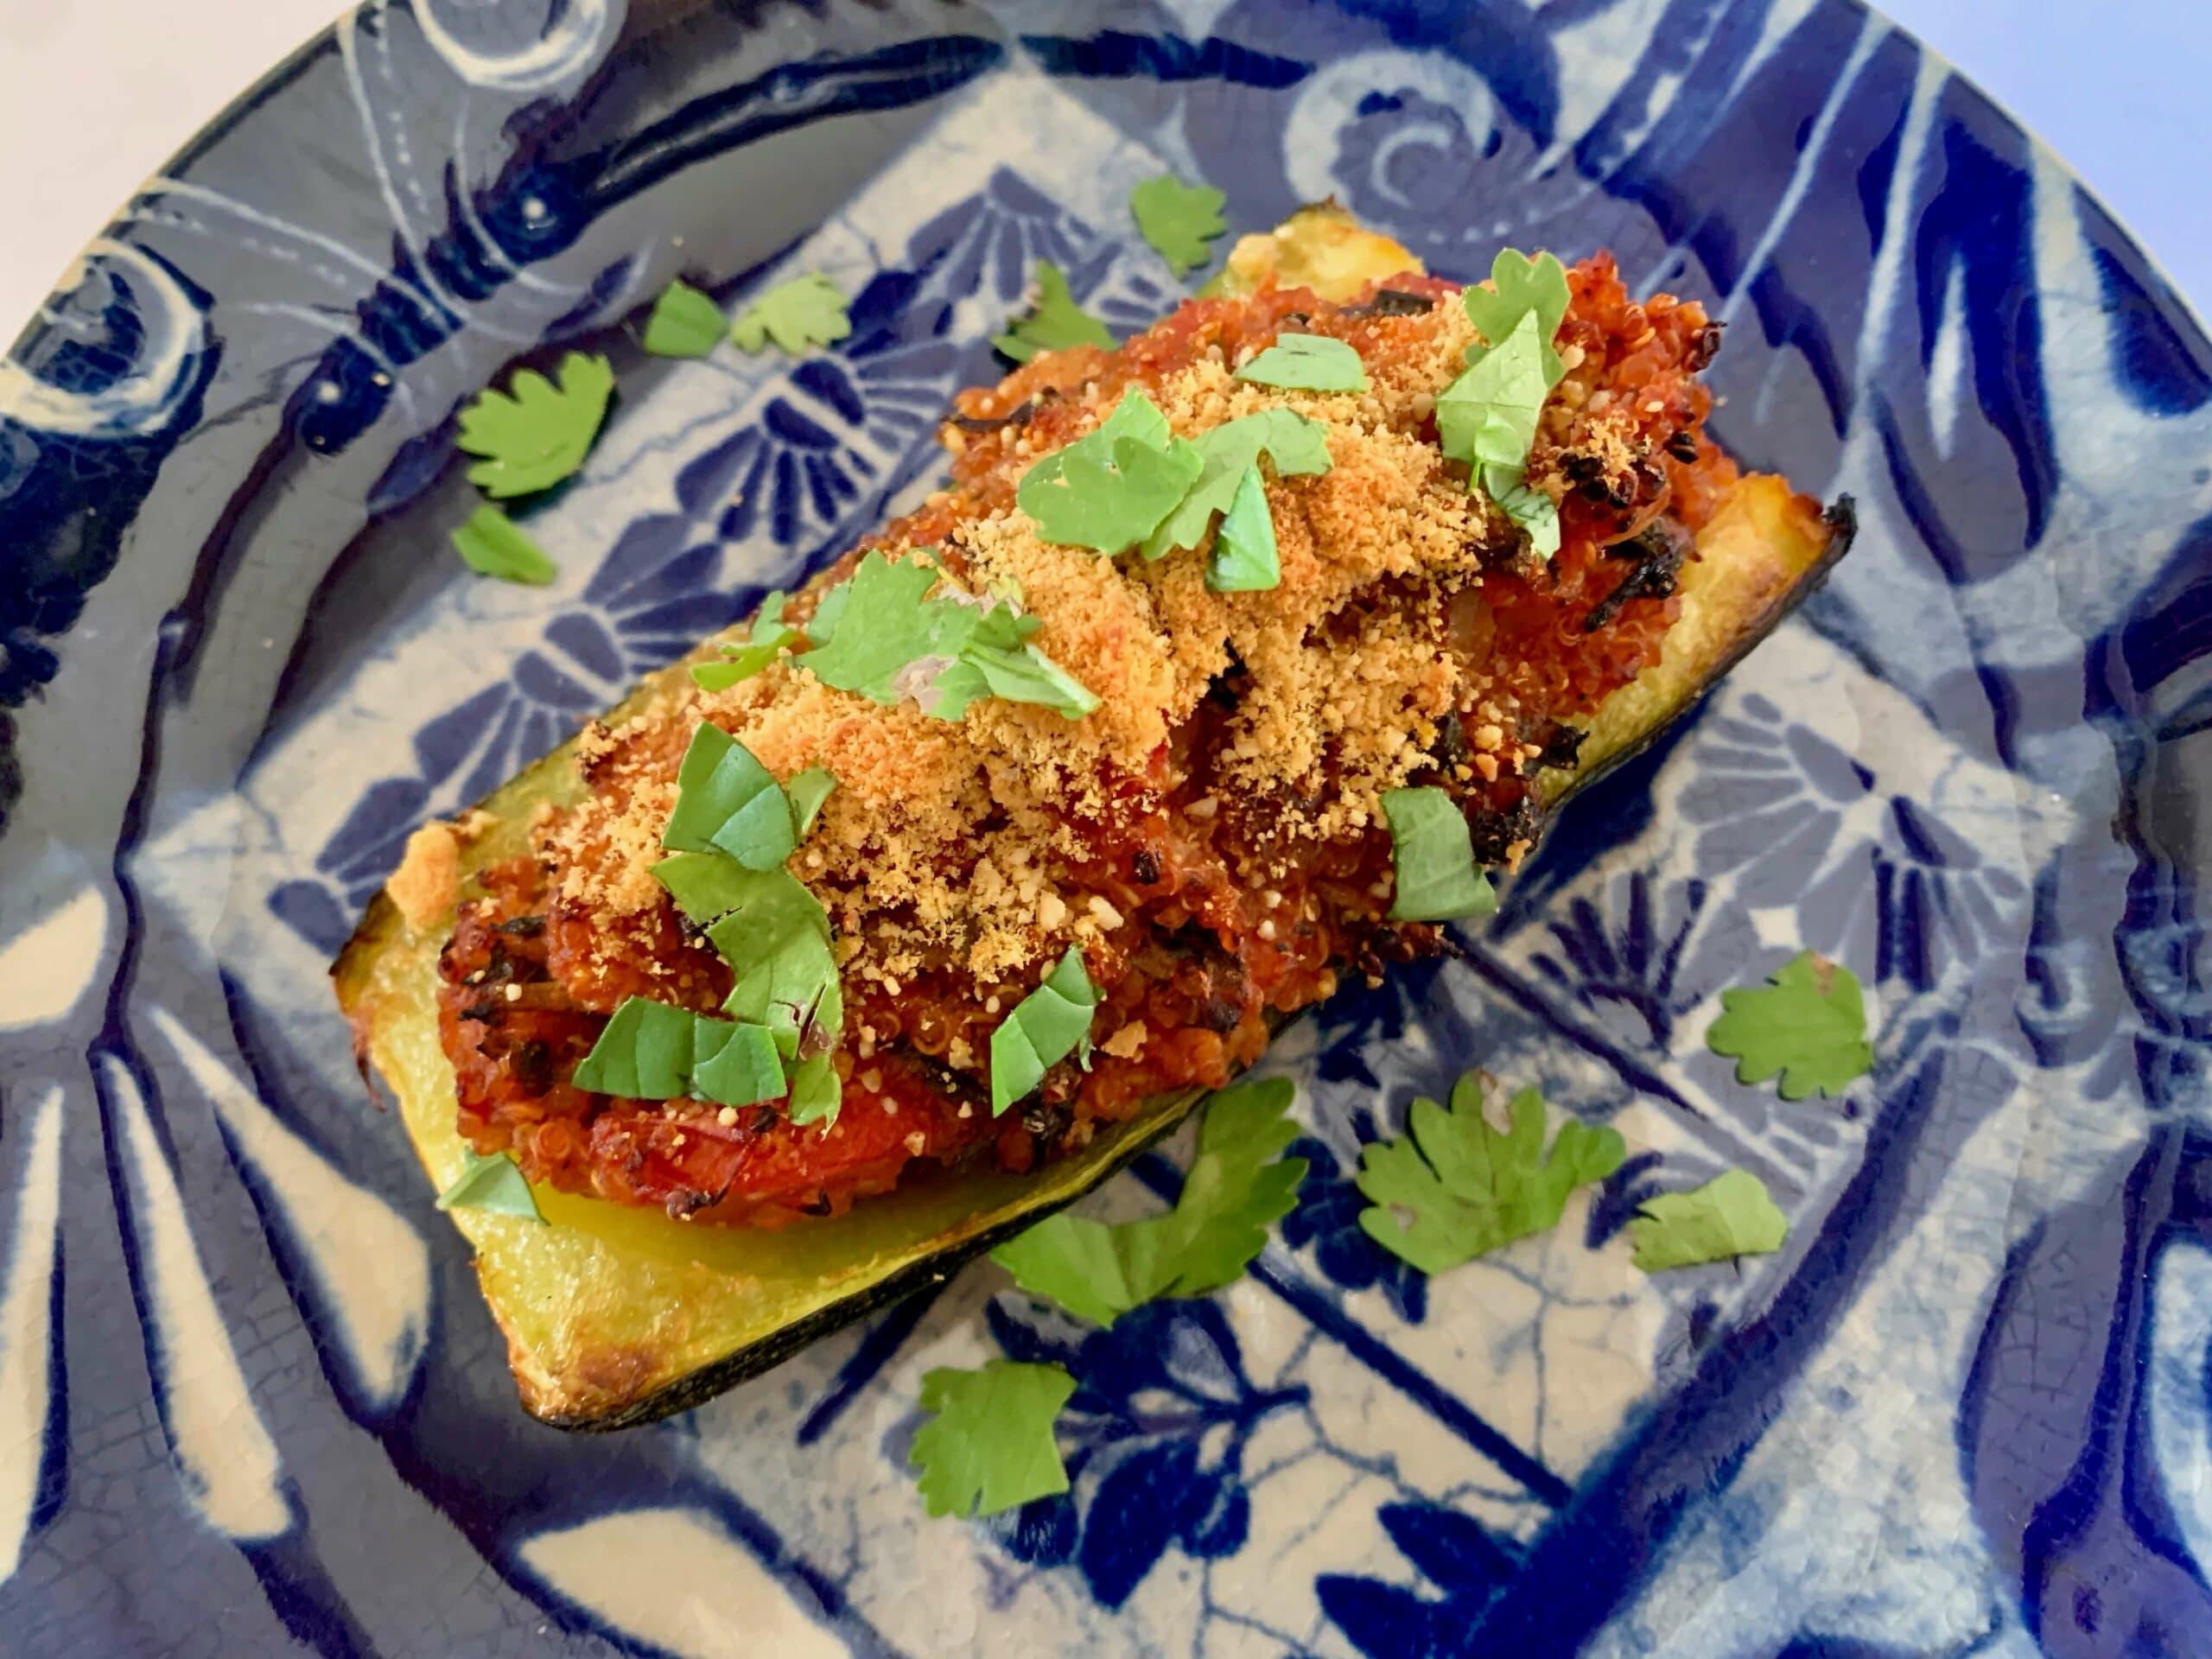 Vegan stuffed zucchini boat